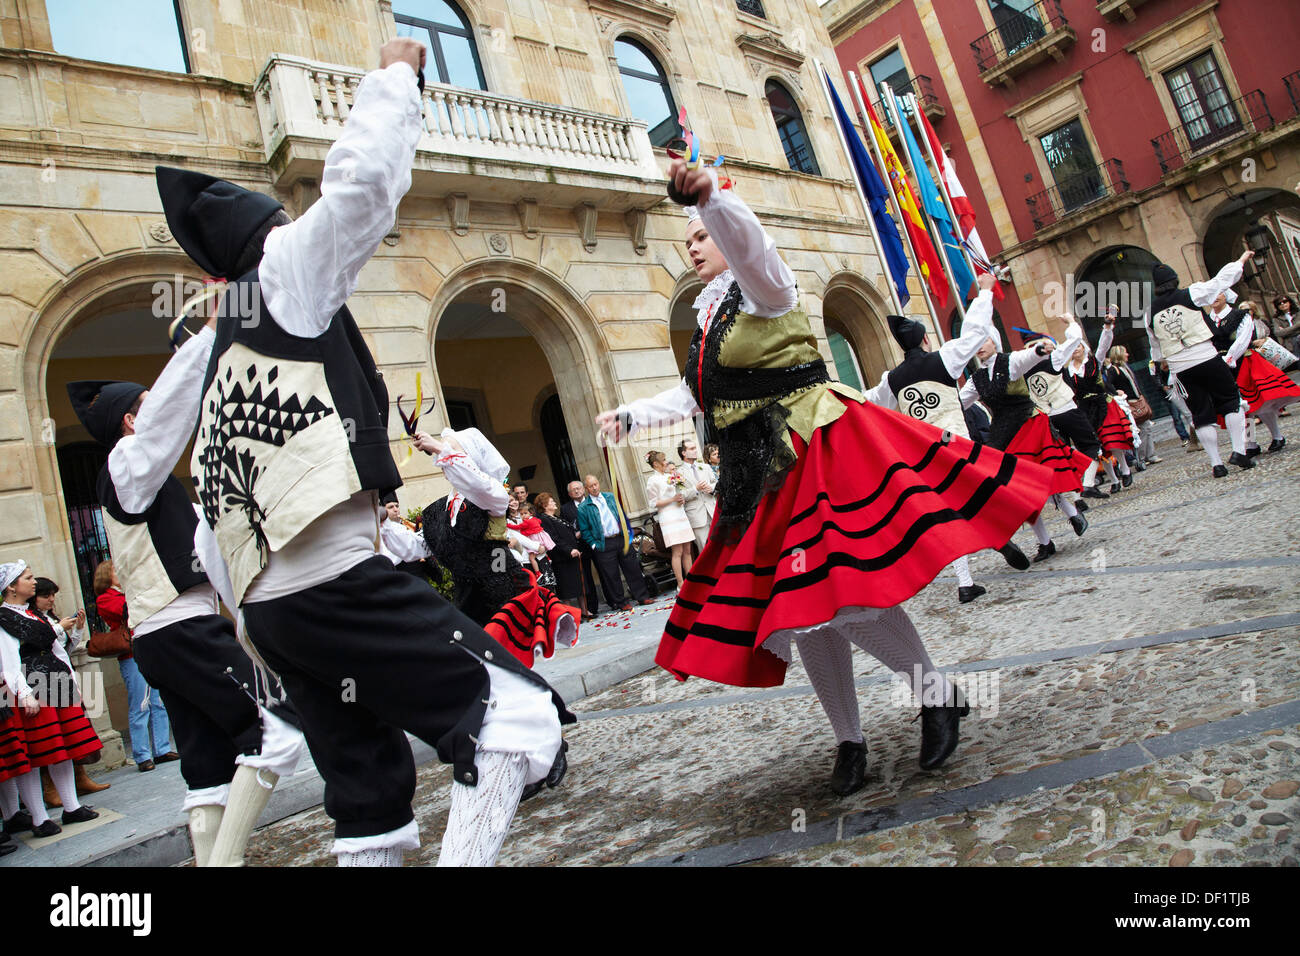 Folk dance, Asturian folklore, Plaza mayor, Gijon, Asturias  Spain. - Stock Image